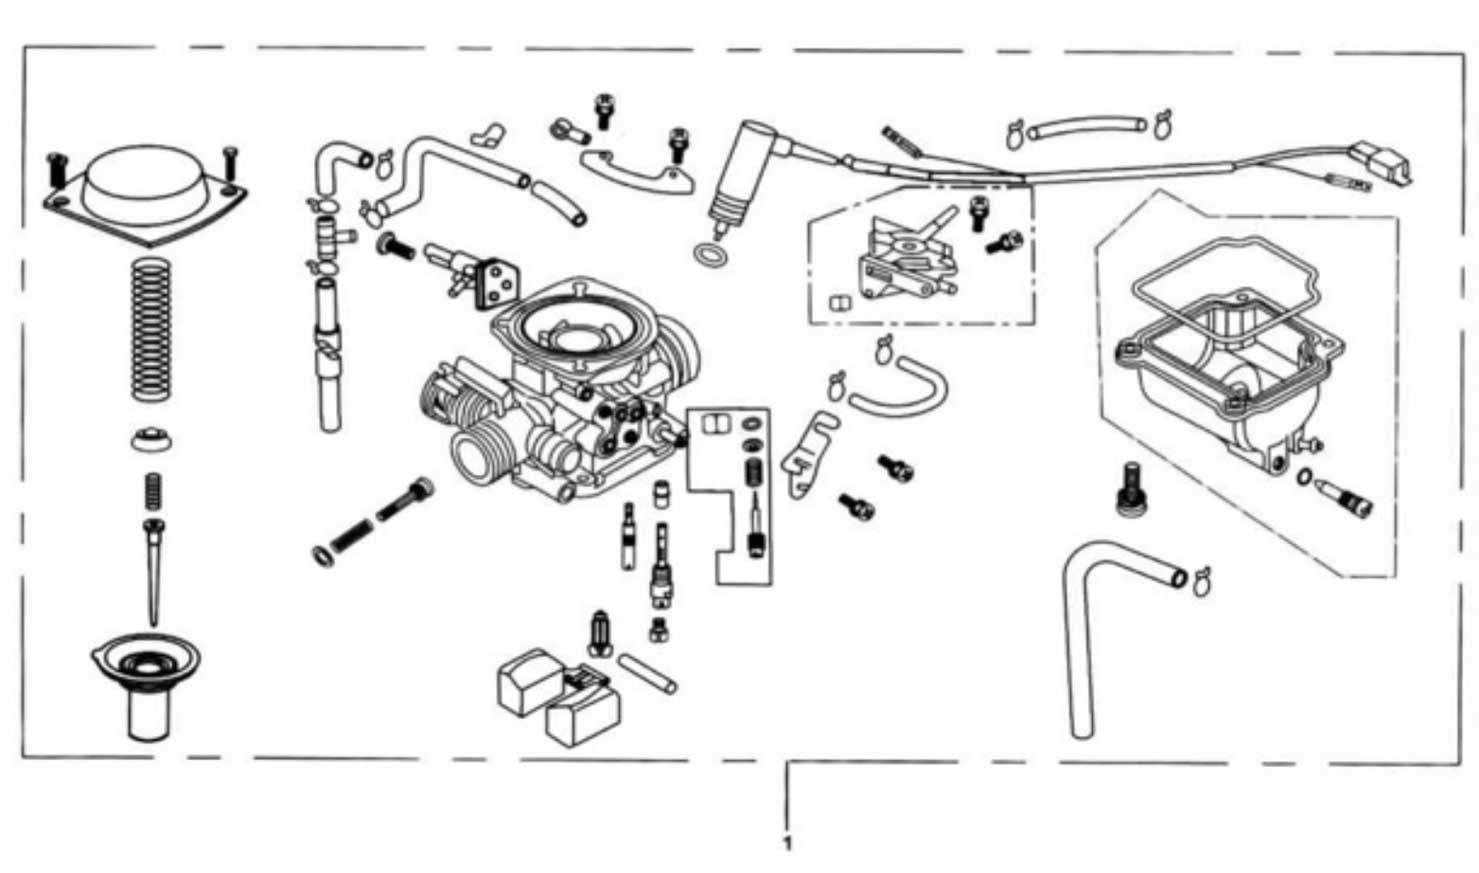 baja 250 engine diagram